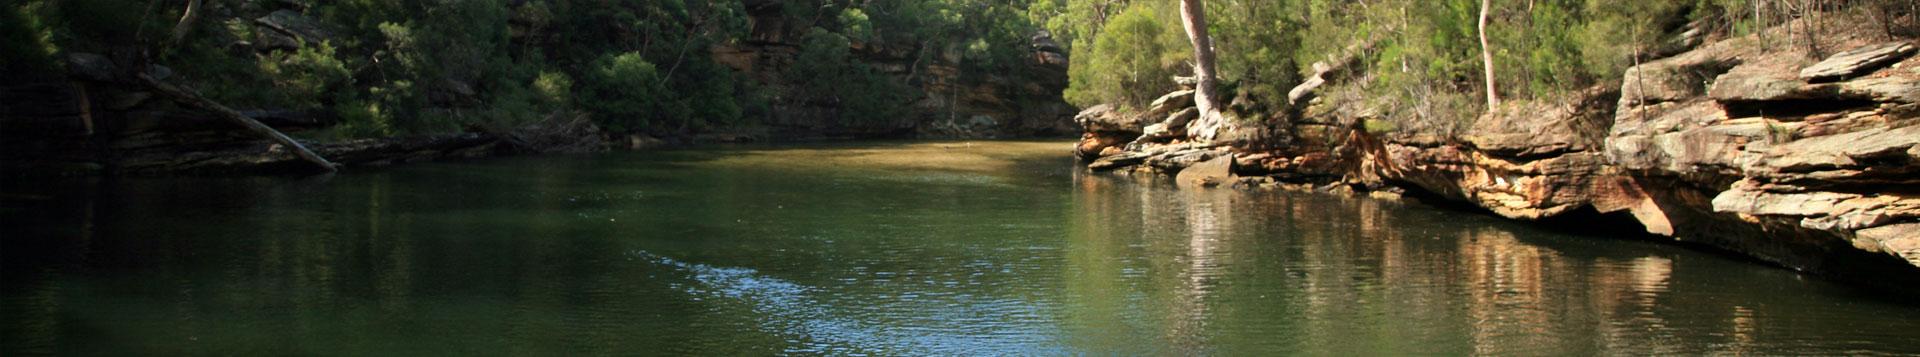 daiwa-river-fishing-rods.jpg